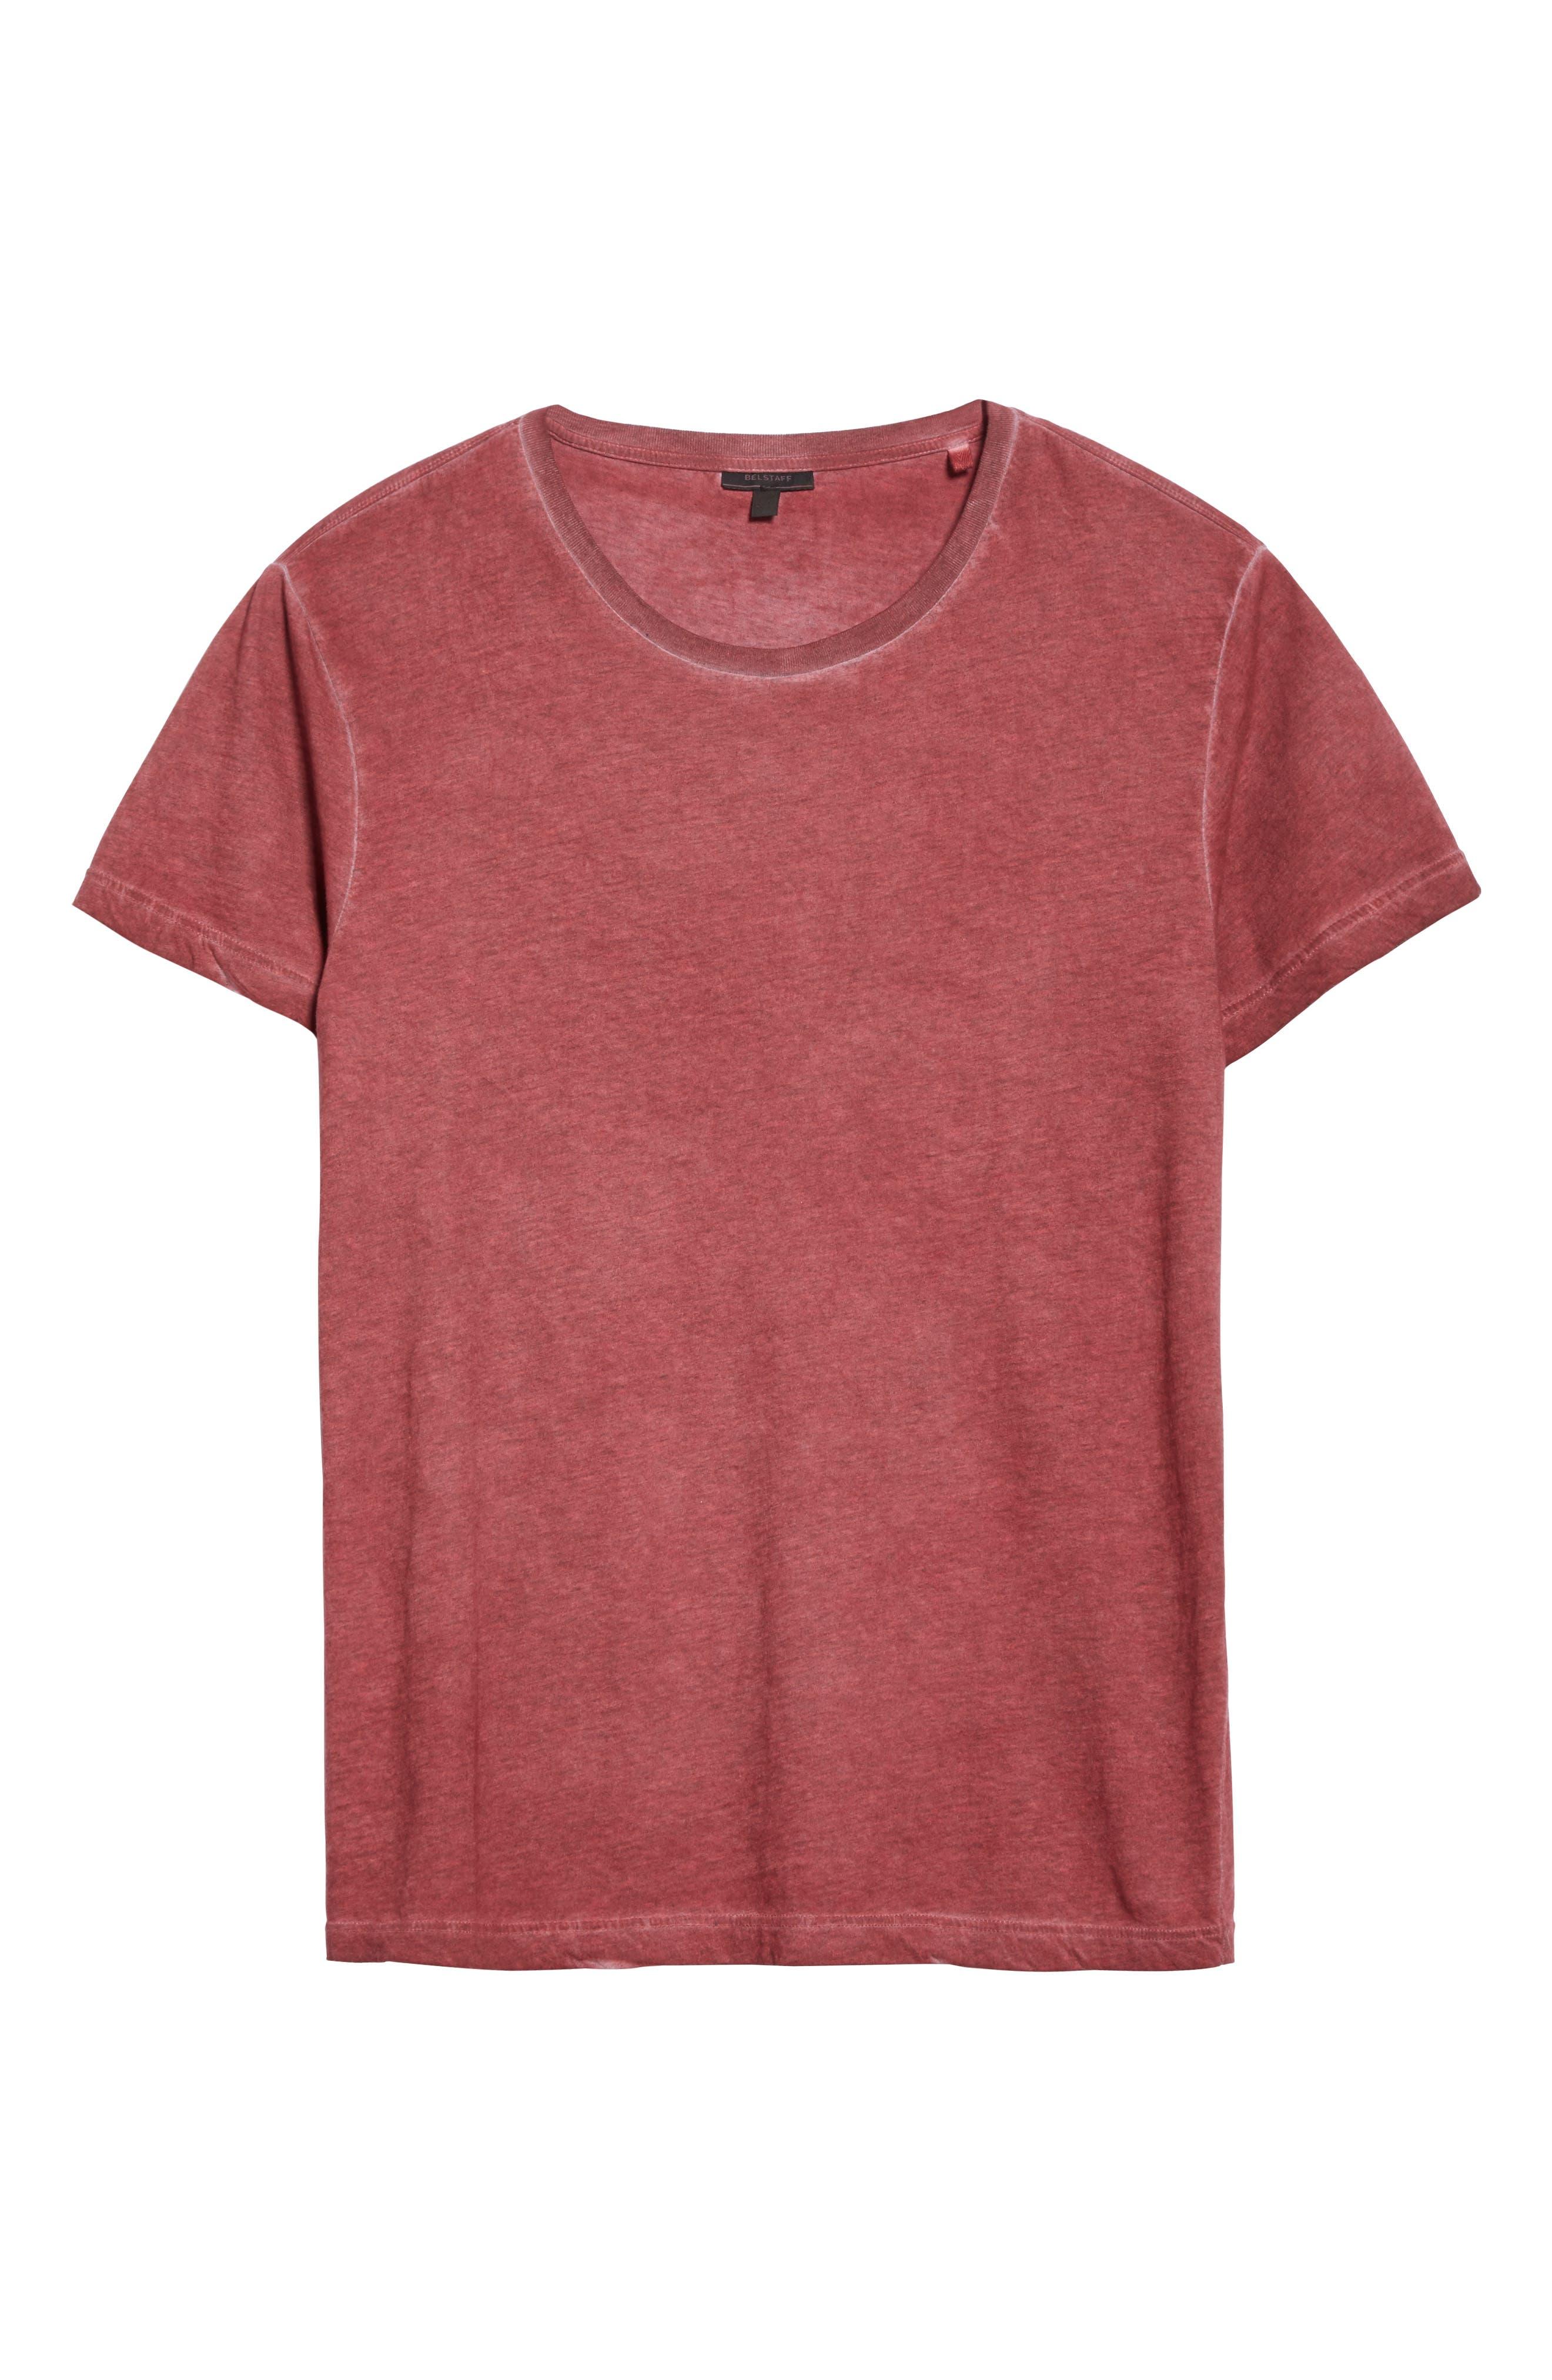 Alternate Image 6  - Belstaff 'Trafford' Cotton Crewneck T-Shirt